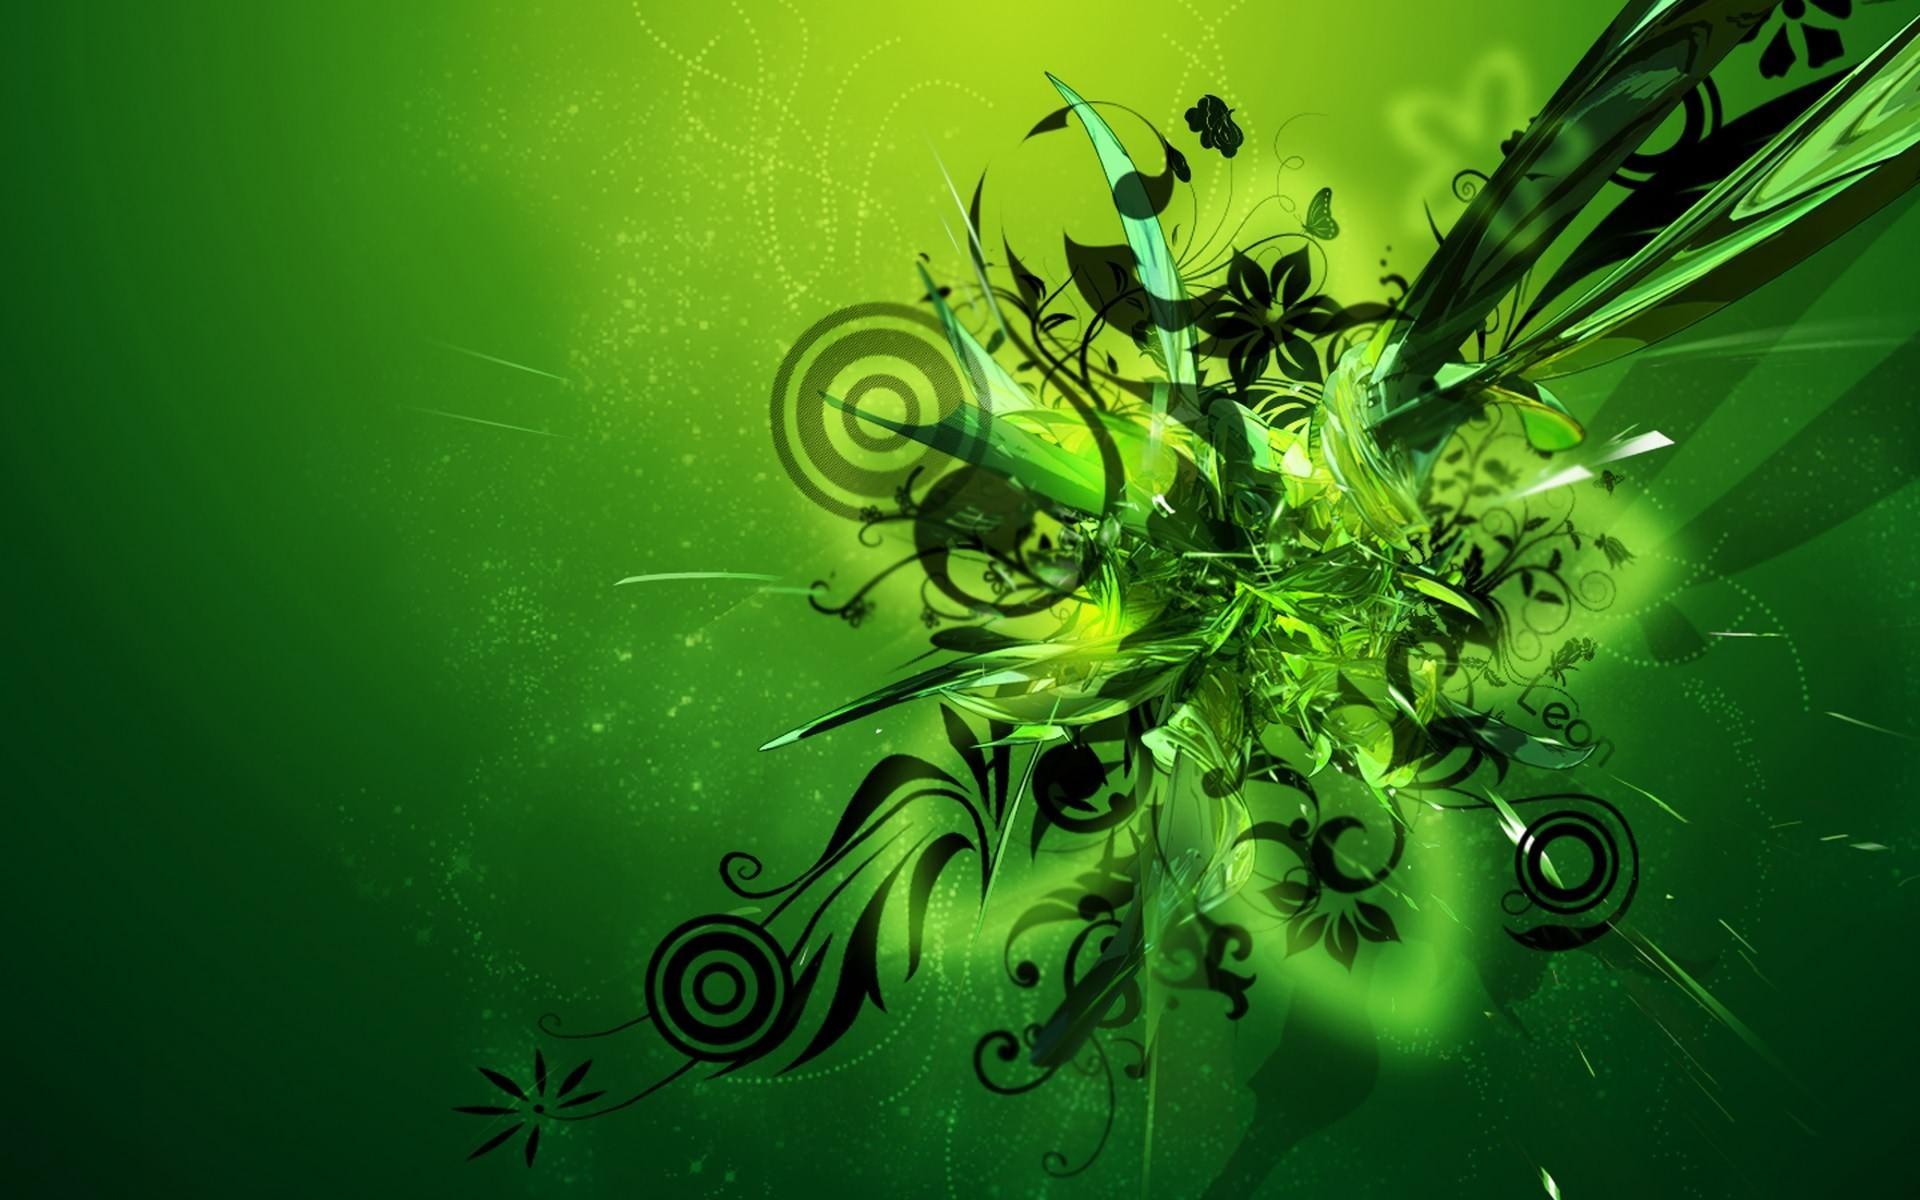 <p>Green</p>